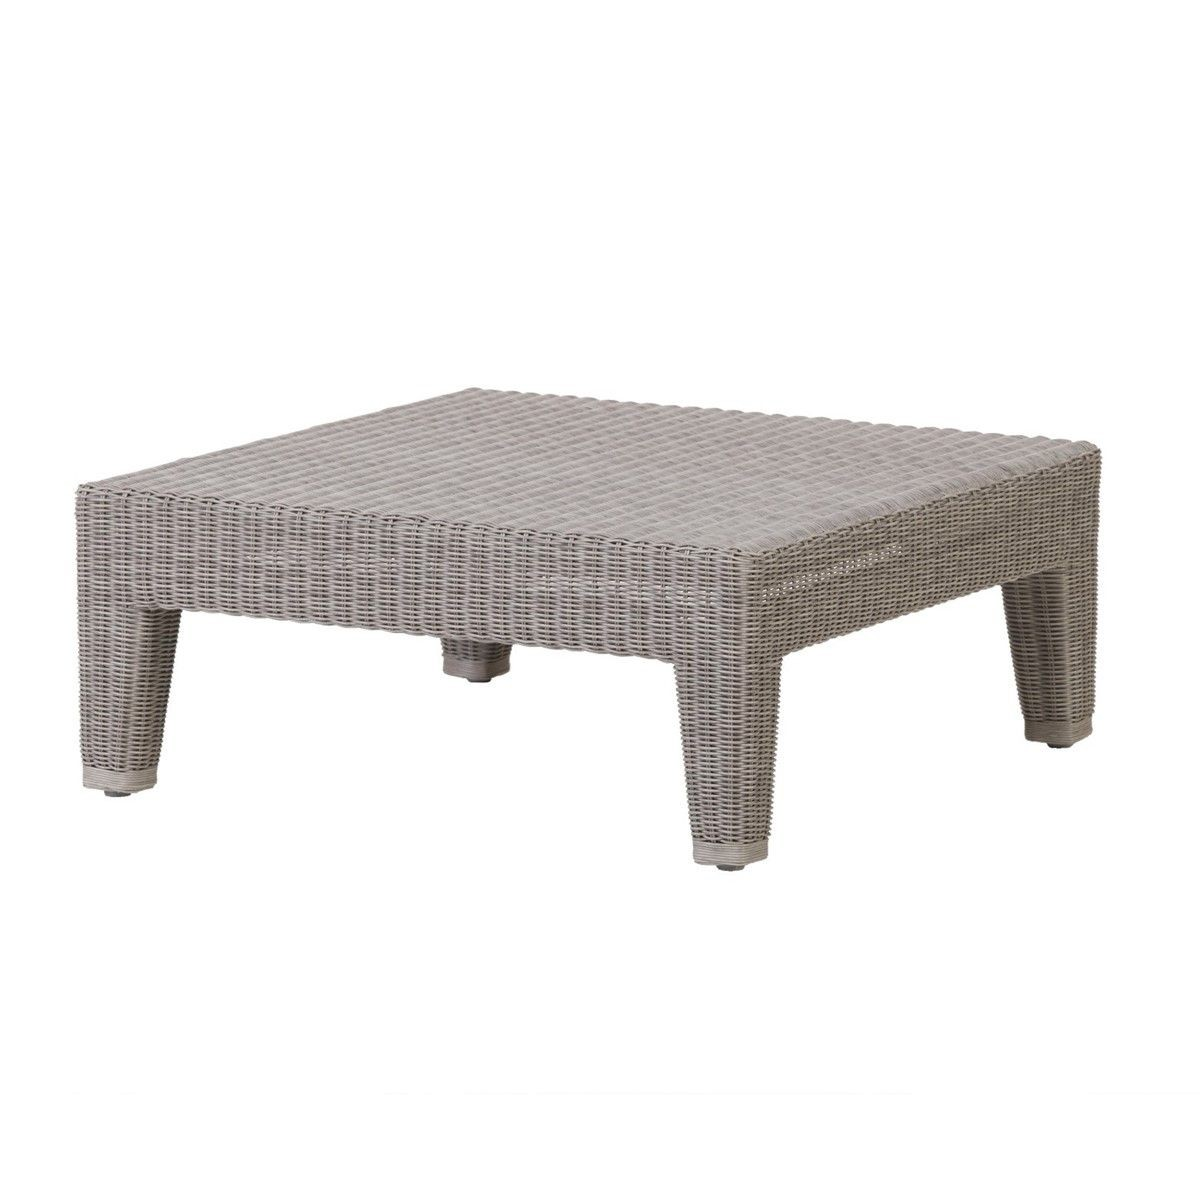 table basse en resine tressee grise ou poivre